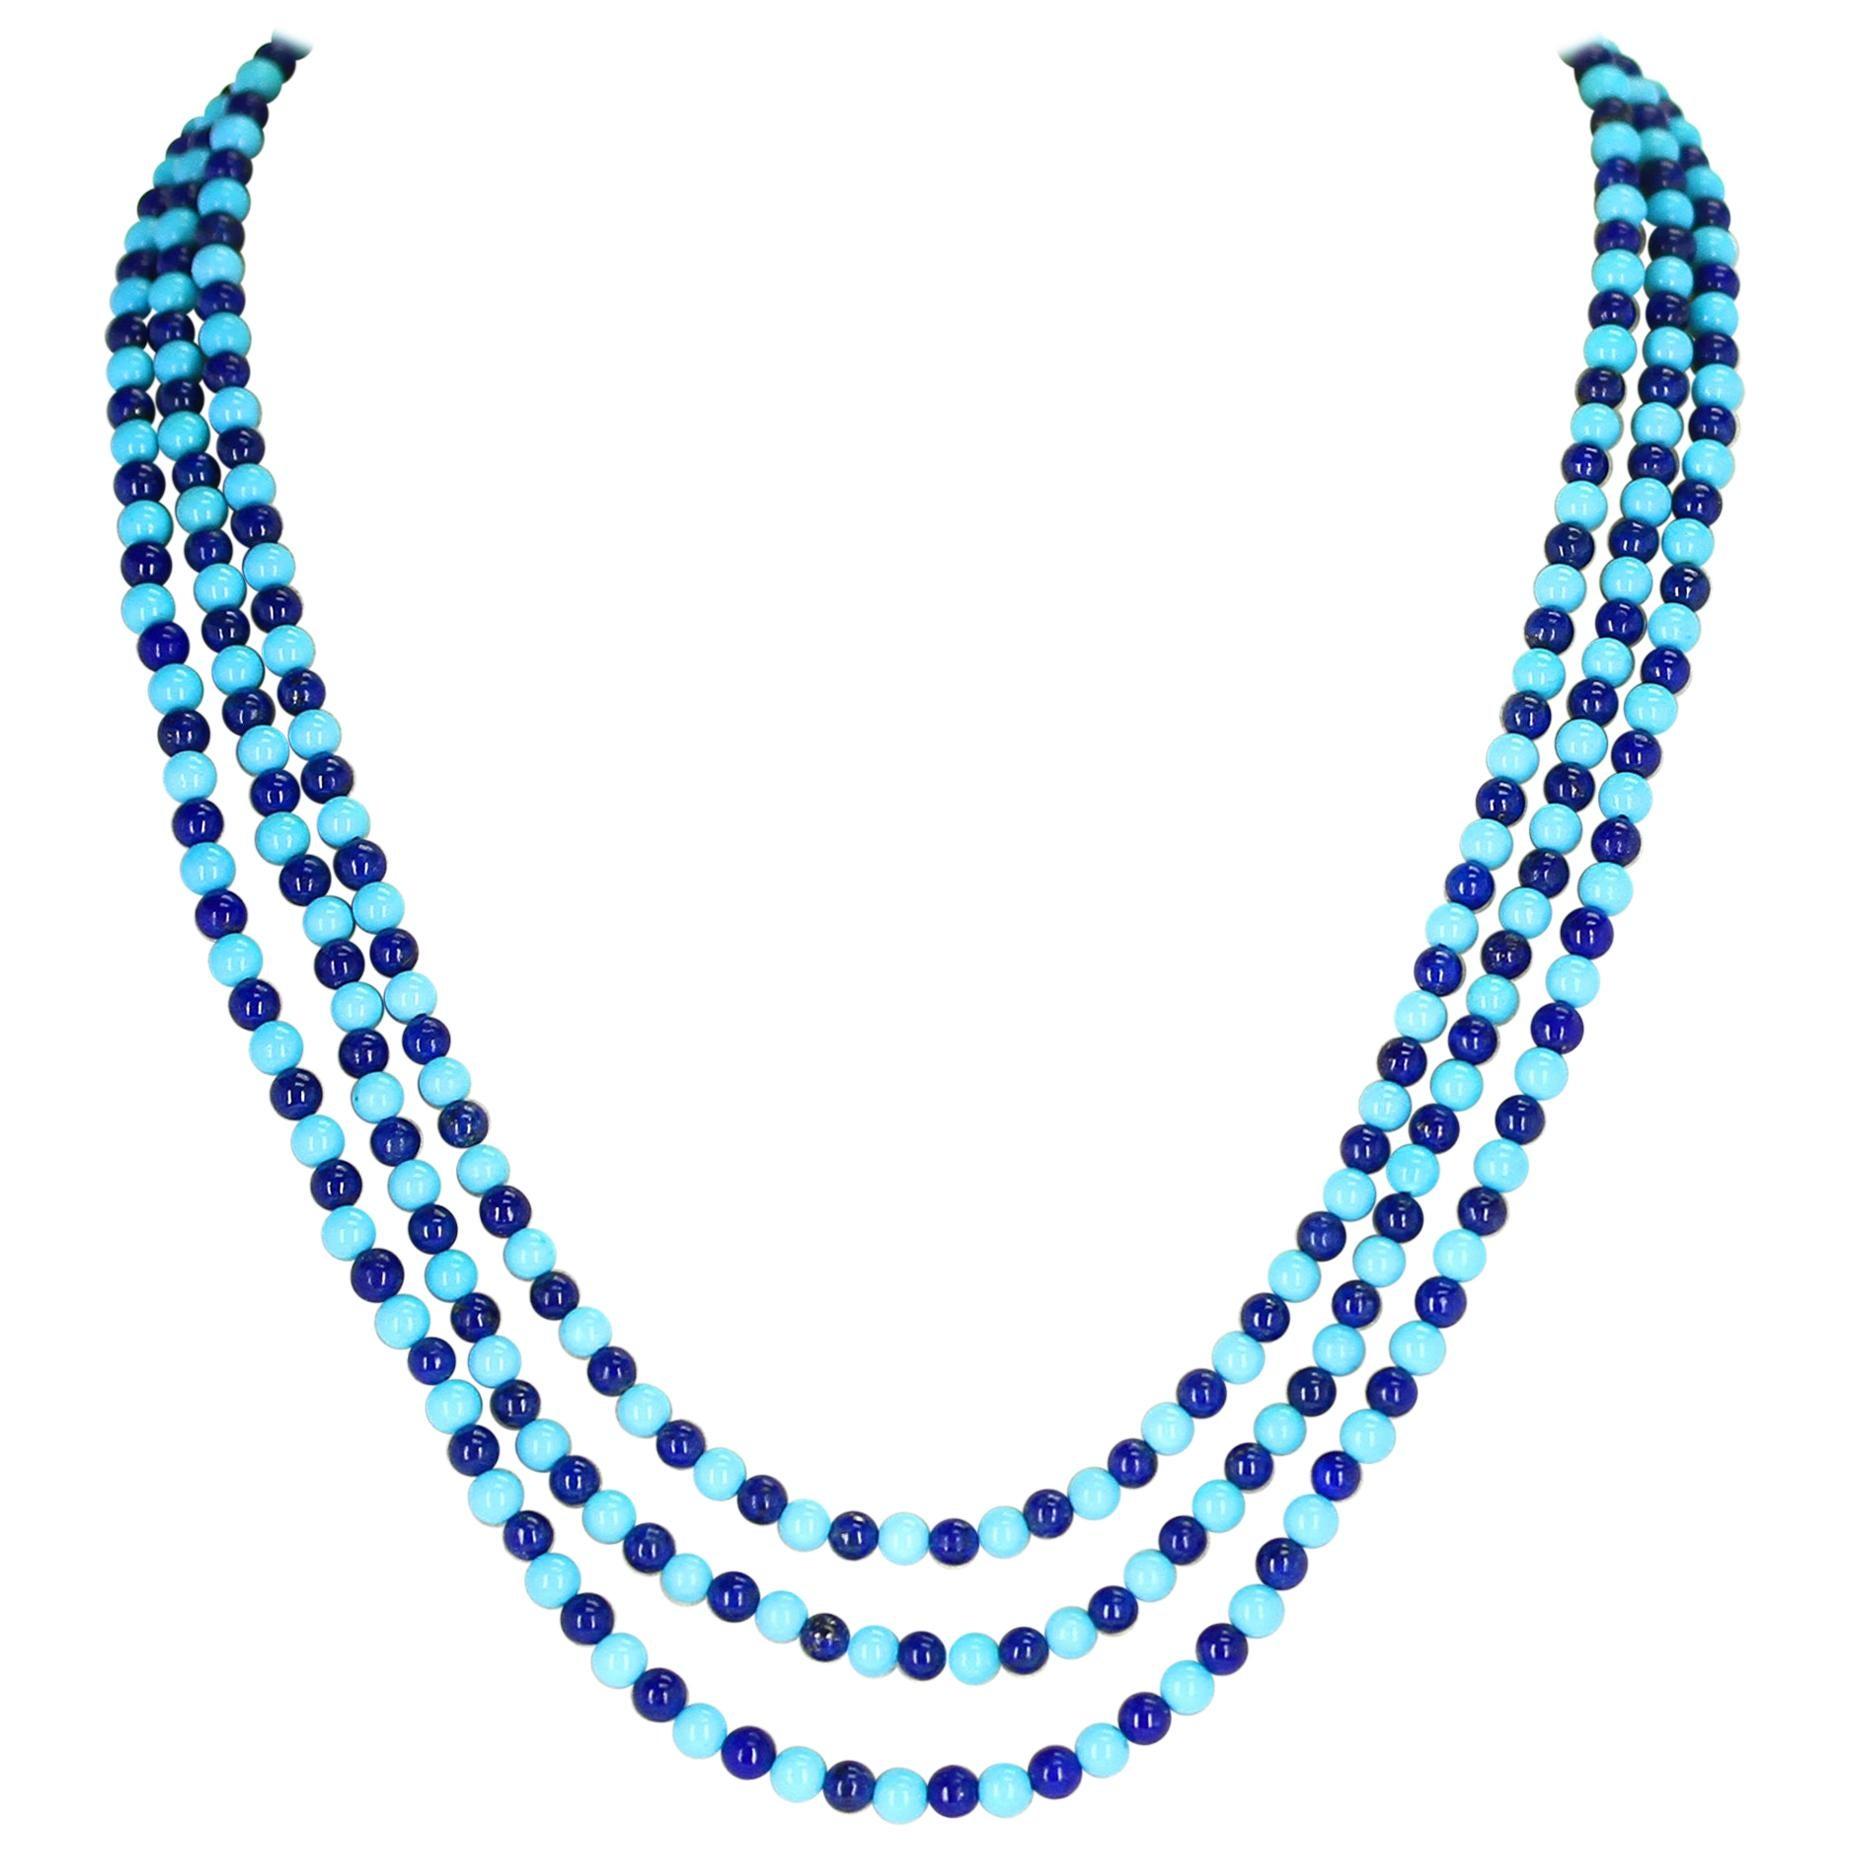 Genuine Turquoise and Lapis Lazuli Beads Necklace, 14 Karat Yellow Gold